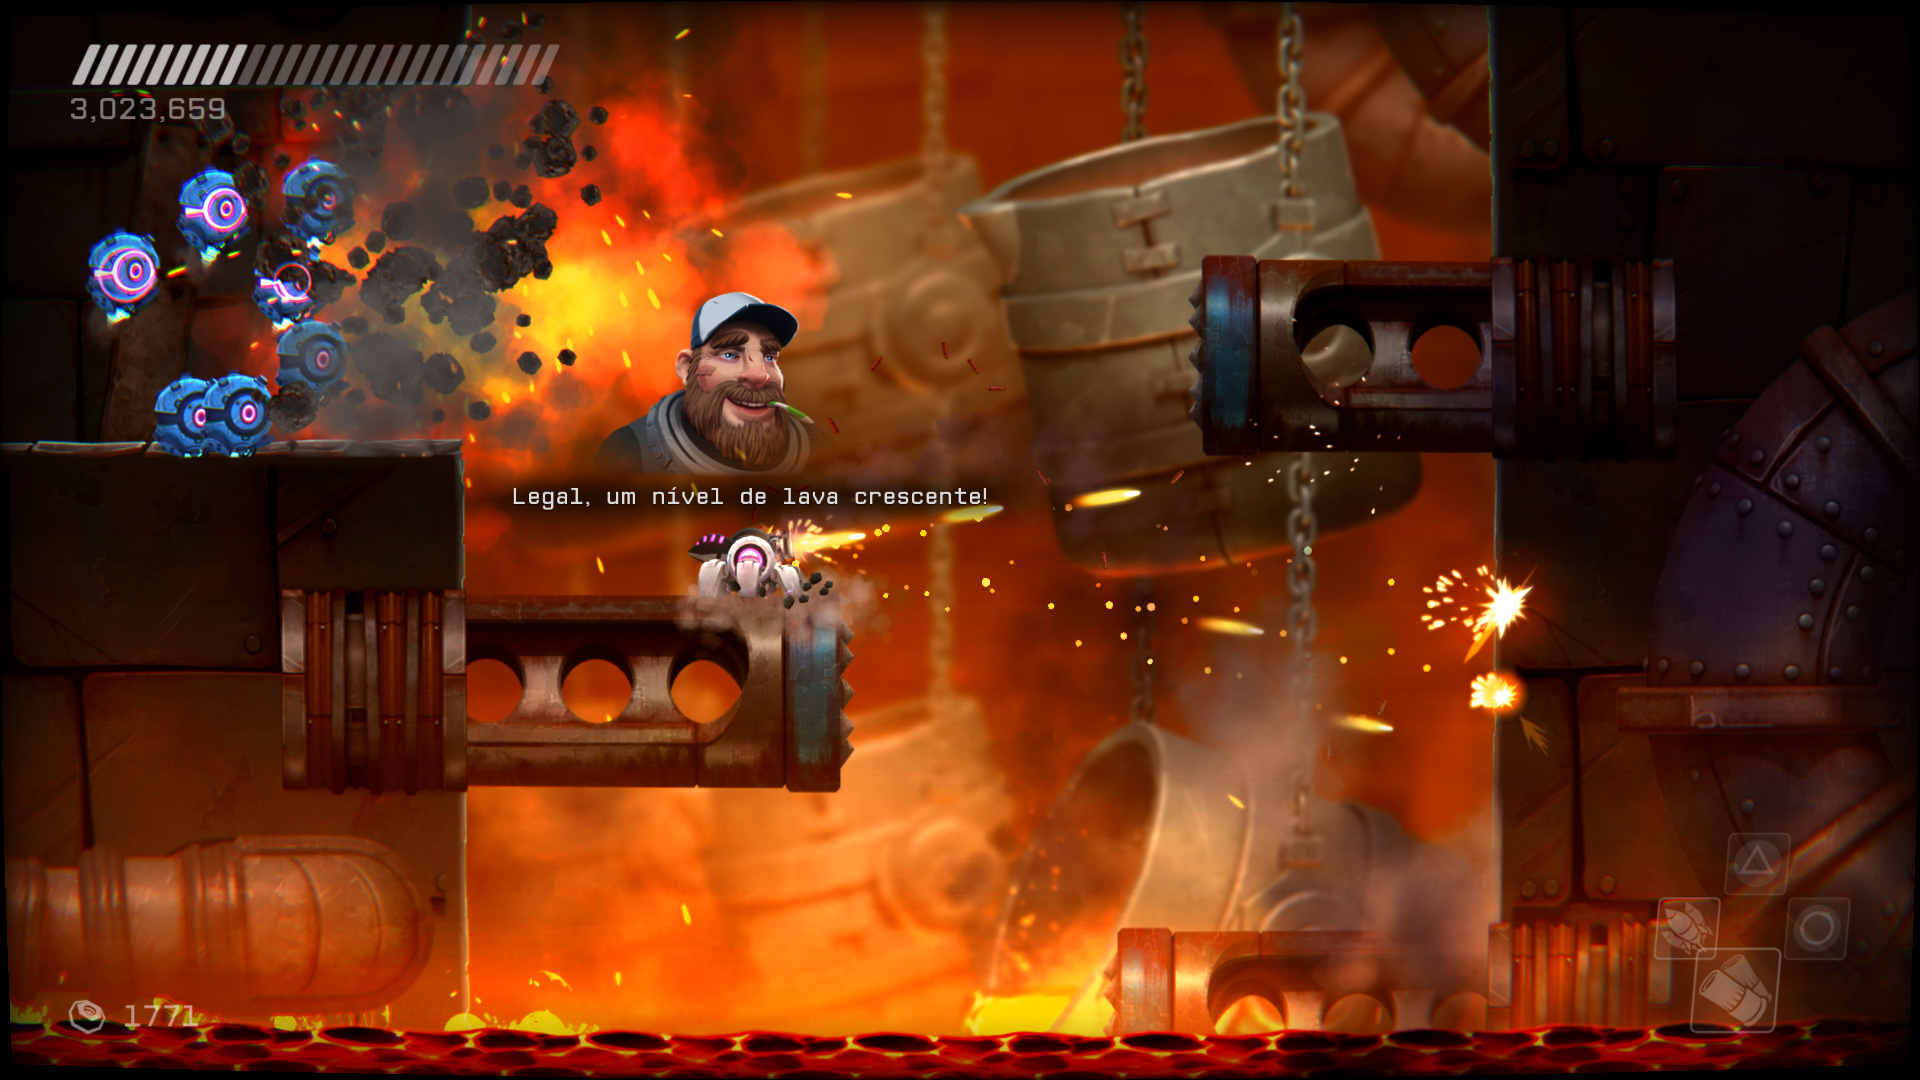 rive-screenshot-1